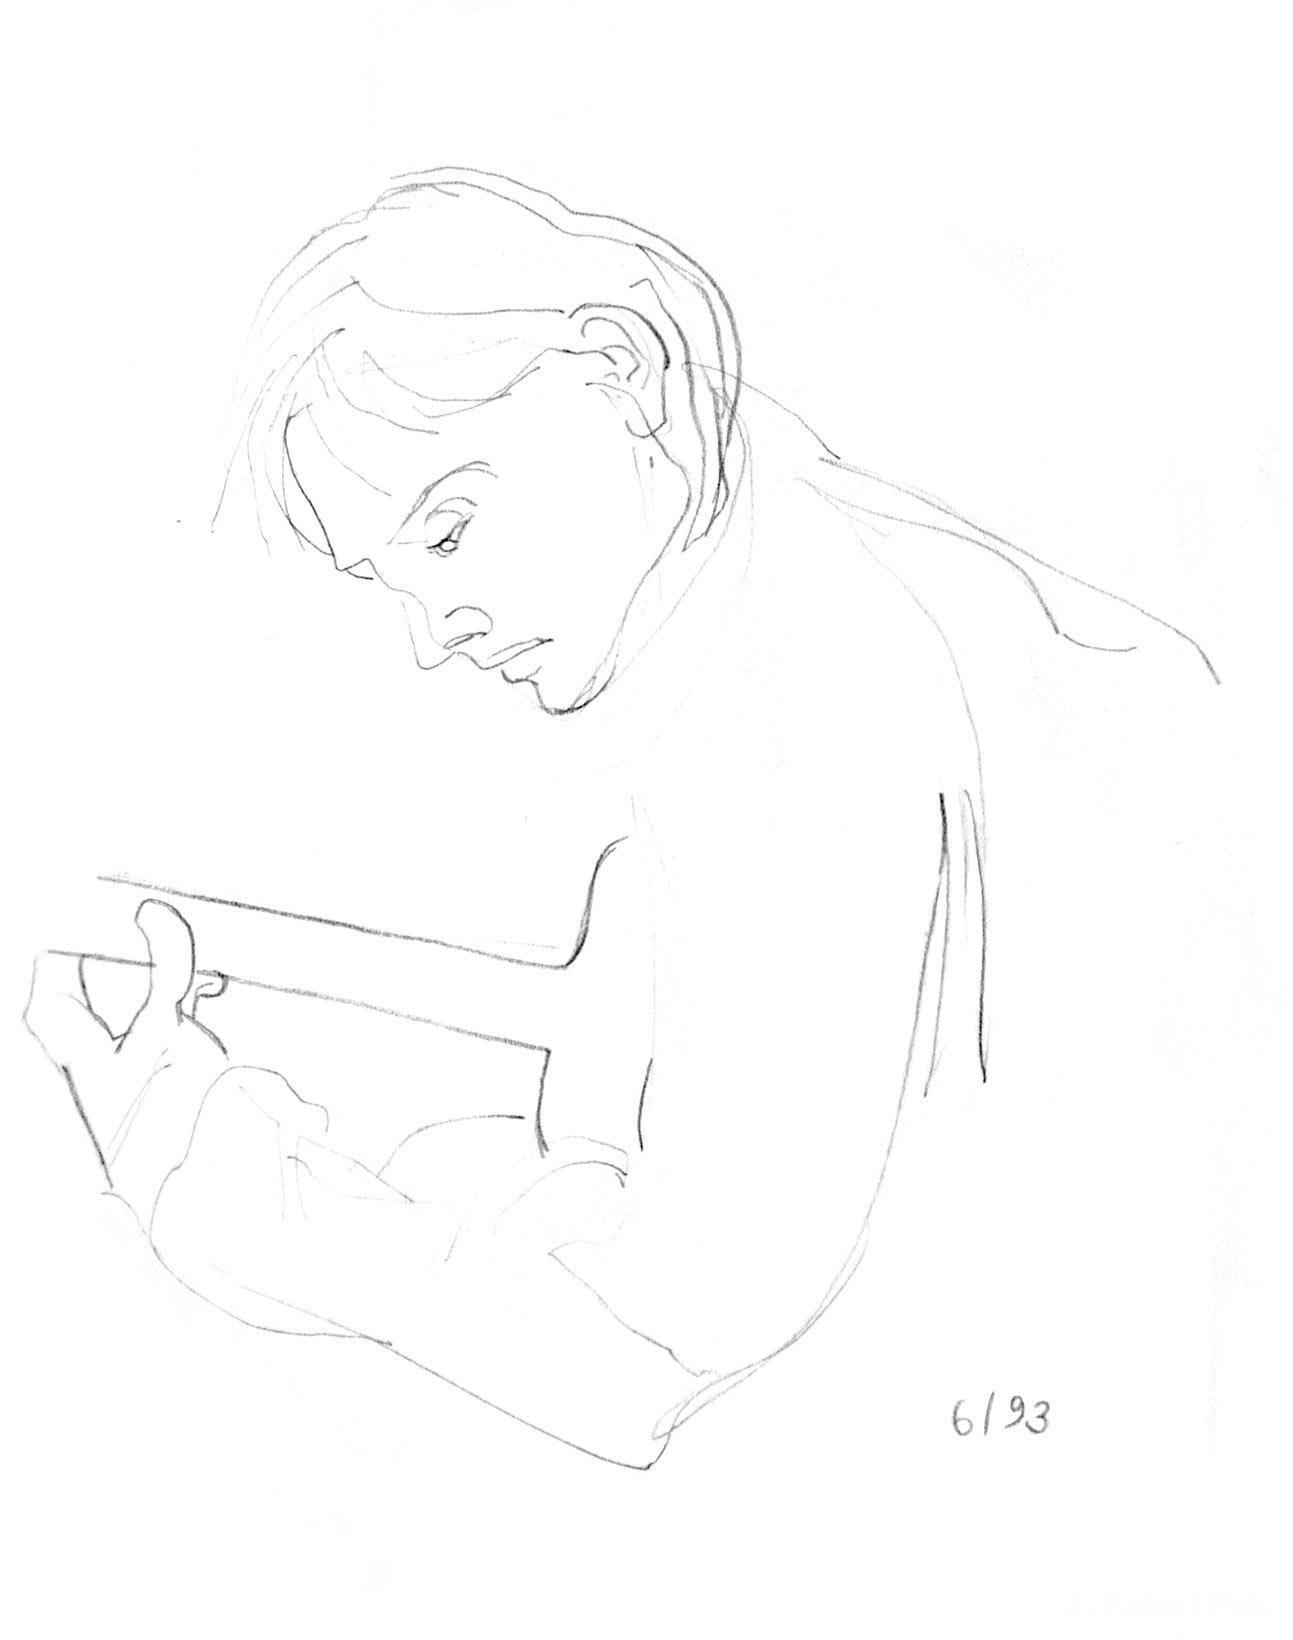 Skizze Gitarrenspieler, Bleistift-Zeichnung, Robert Puls